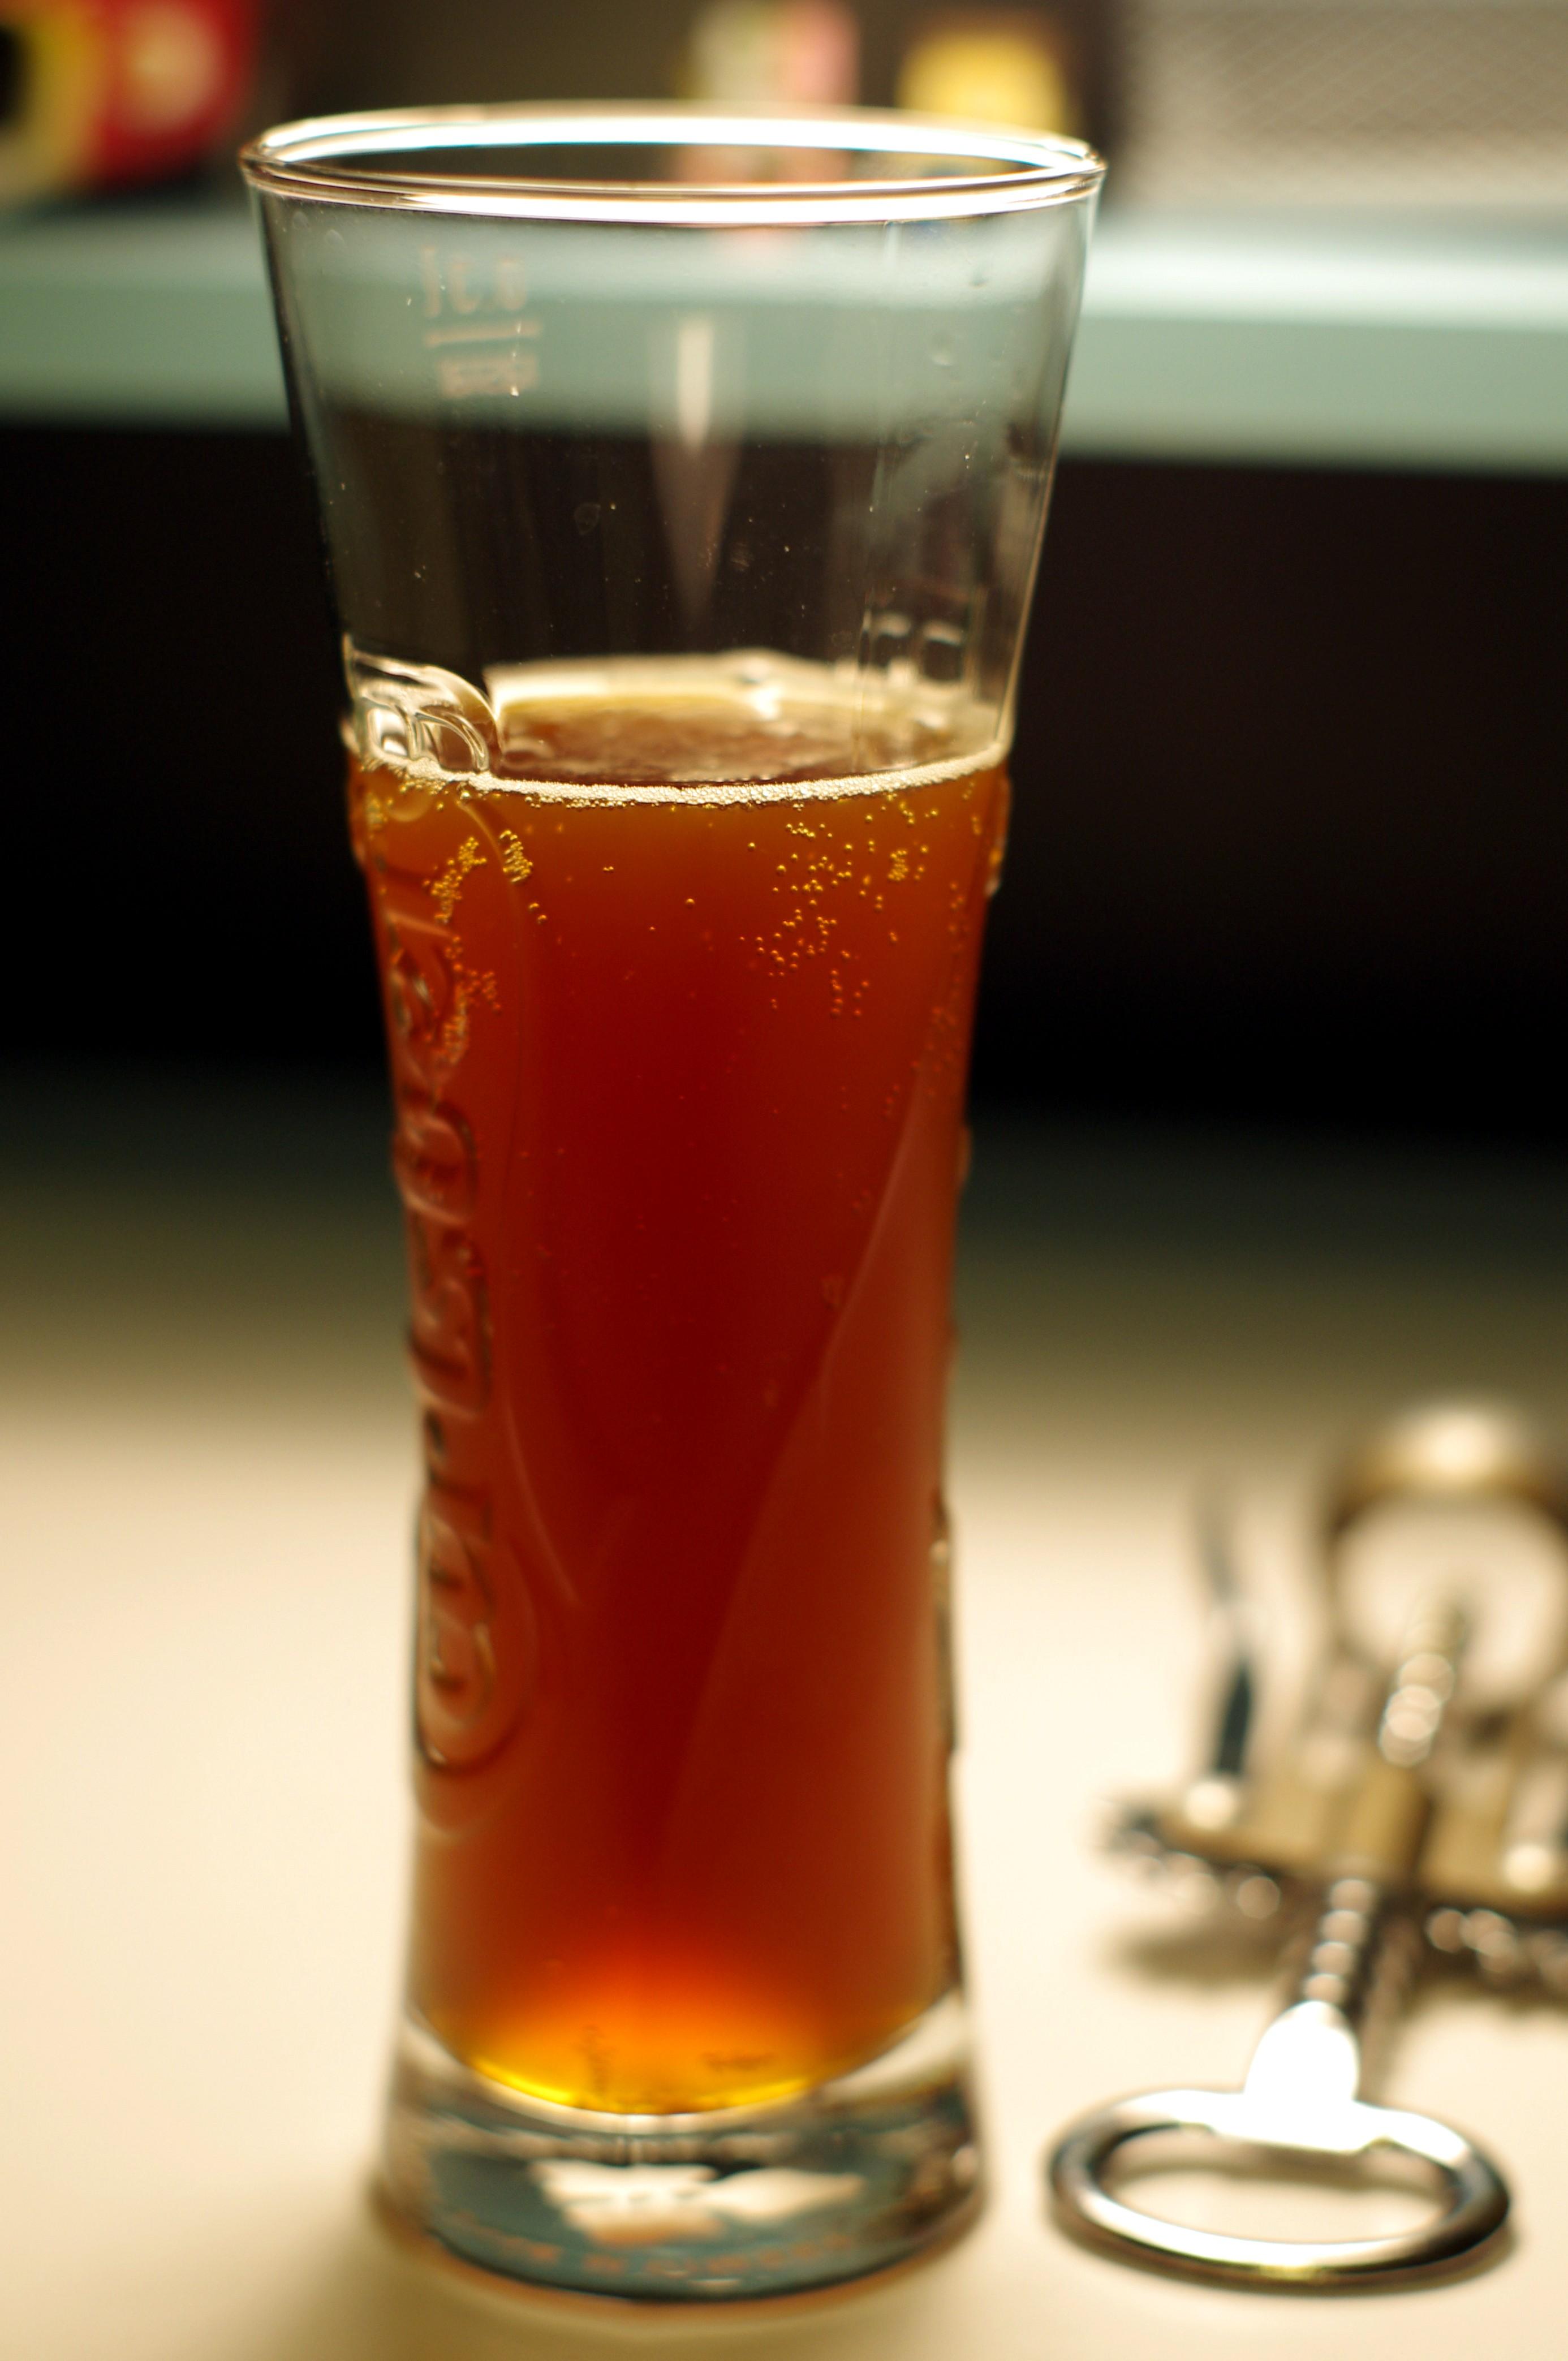 Irish Beer - Irish Red Ale - Beer Recipes - Brewer's Friend